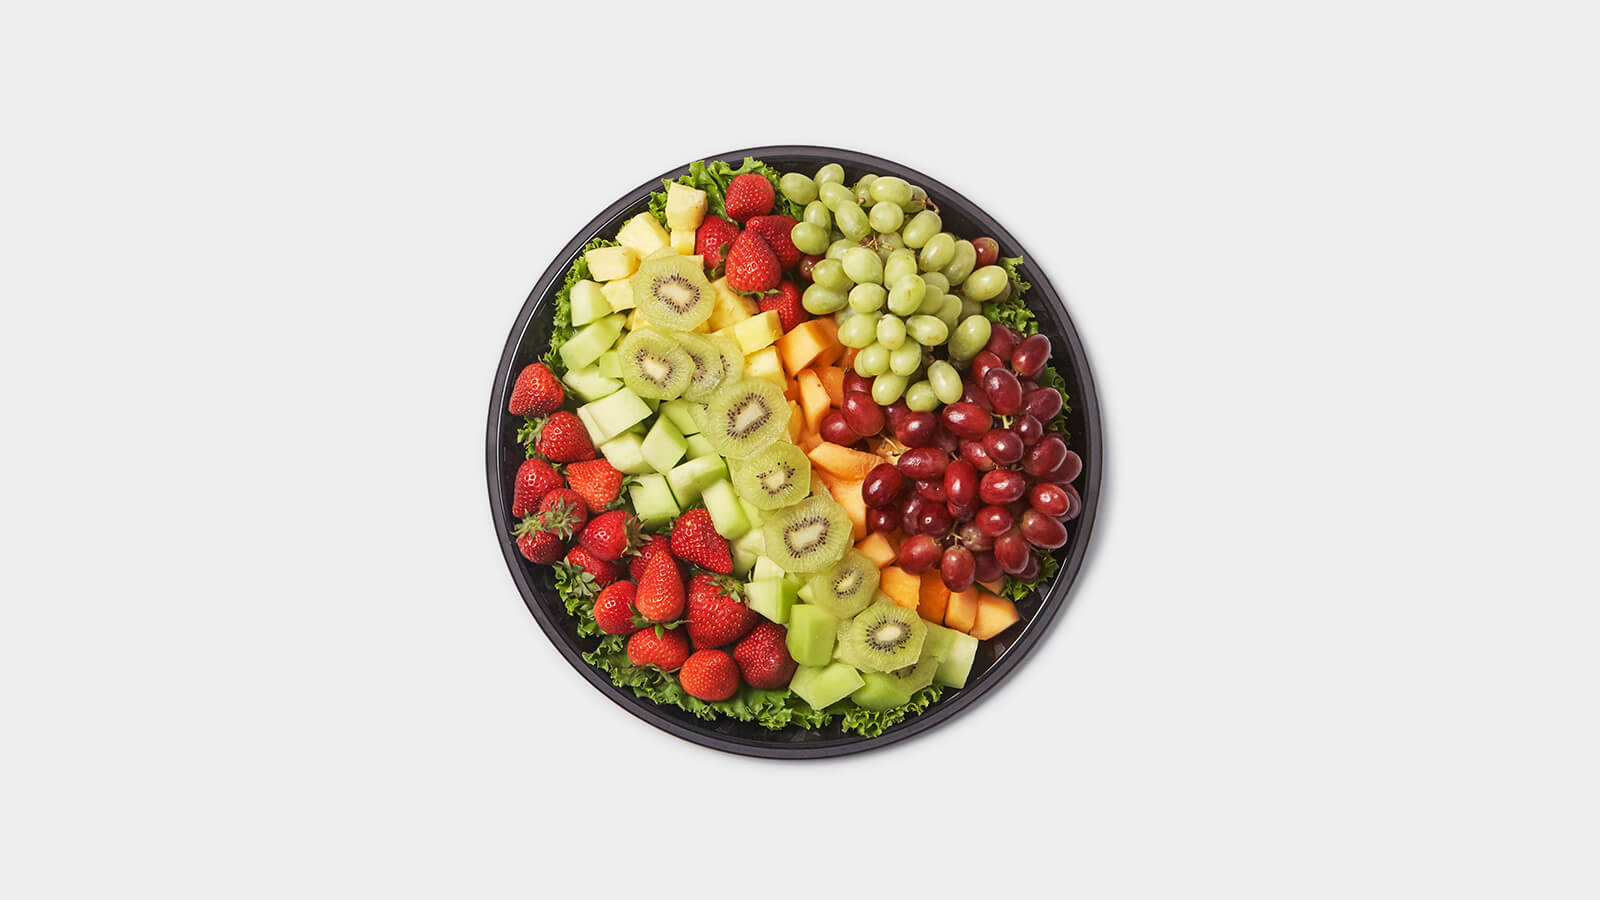 Catering Fresh Platters Market